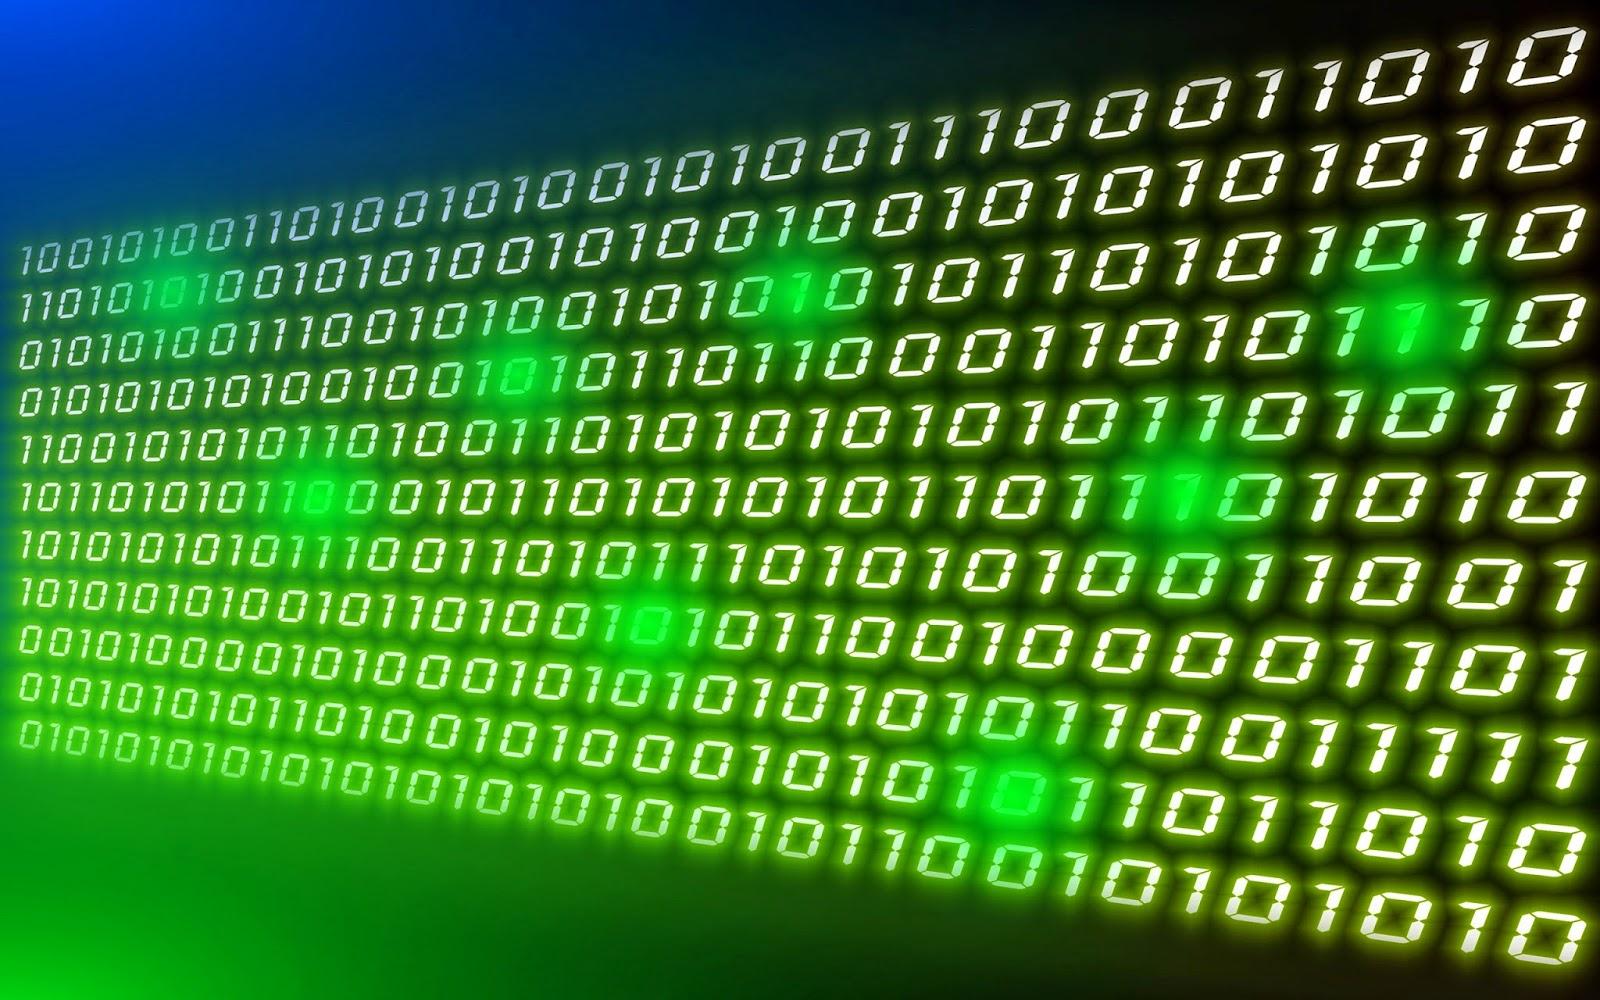 Decimal to binary numbers - Tech Urdu computer deleted data